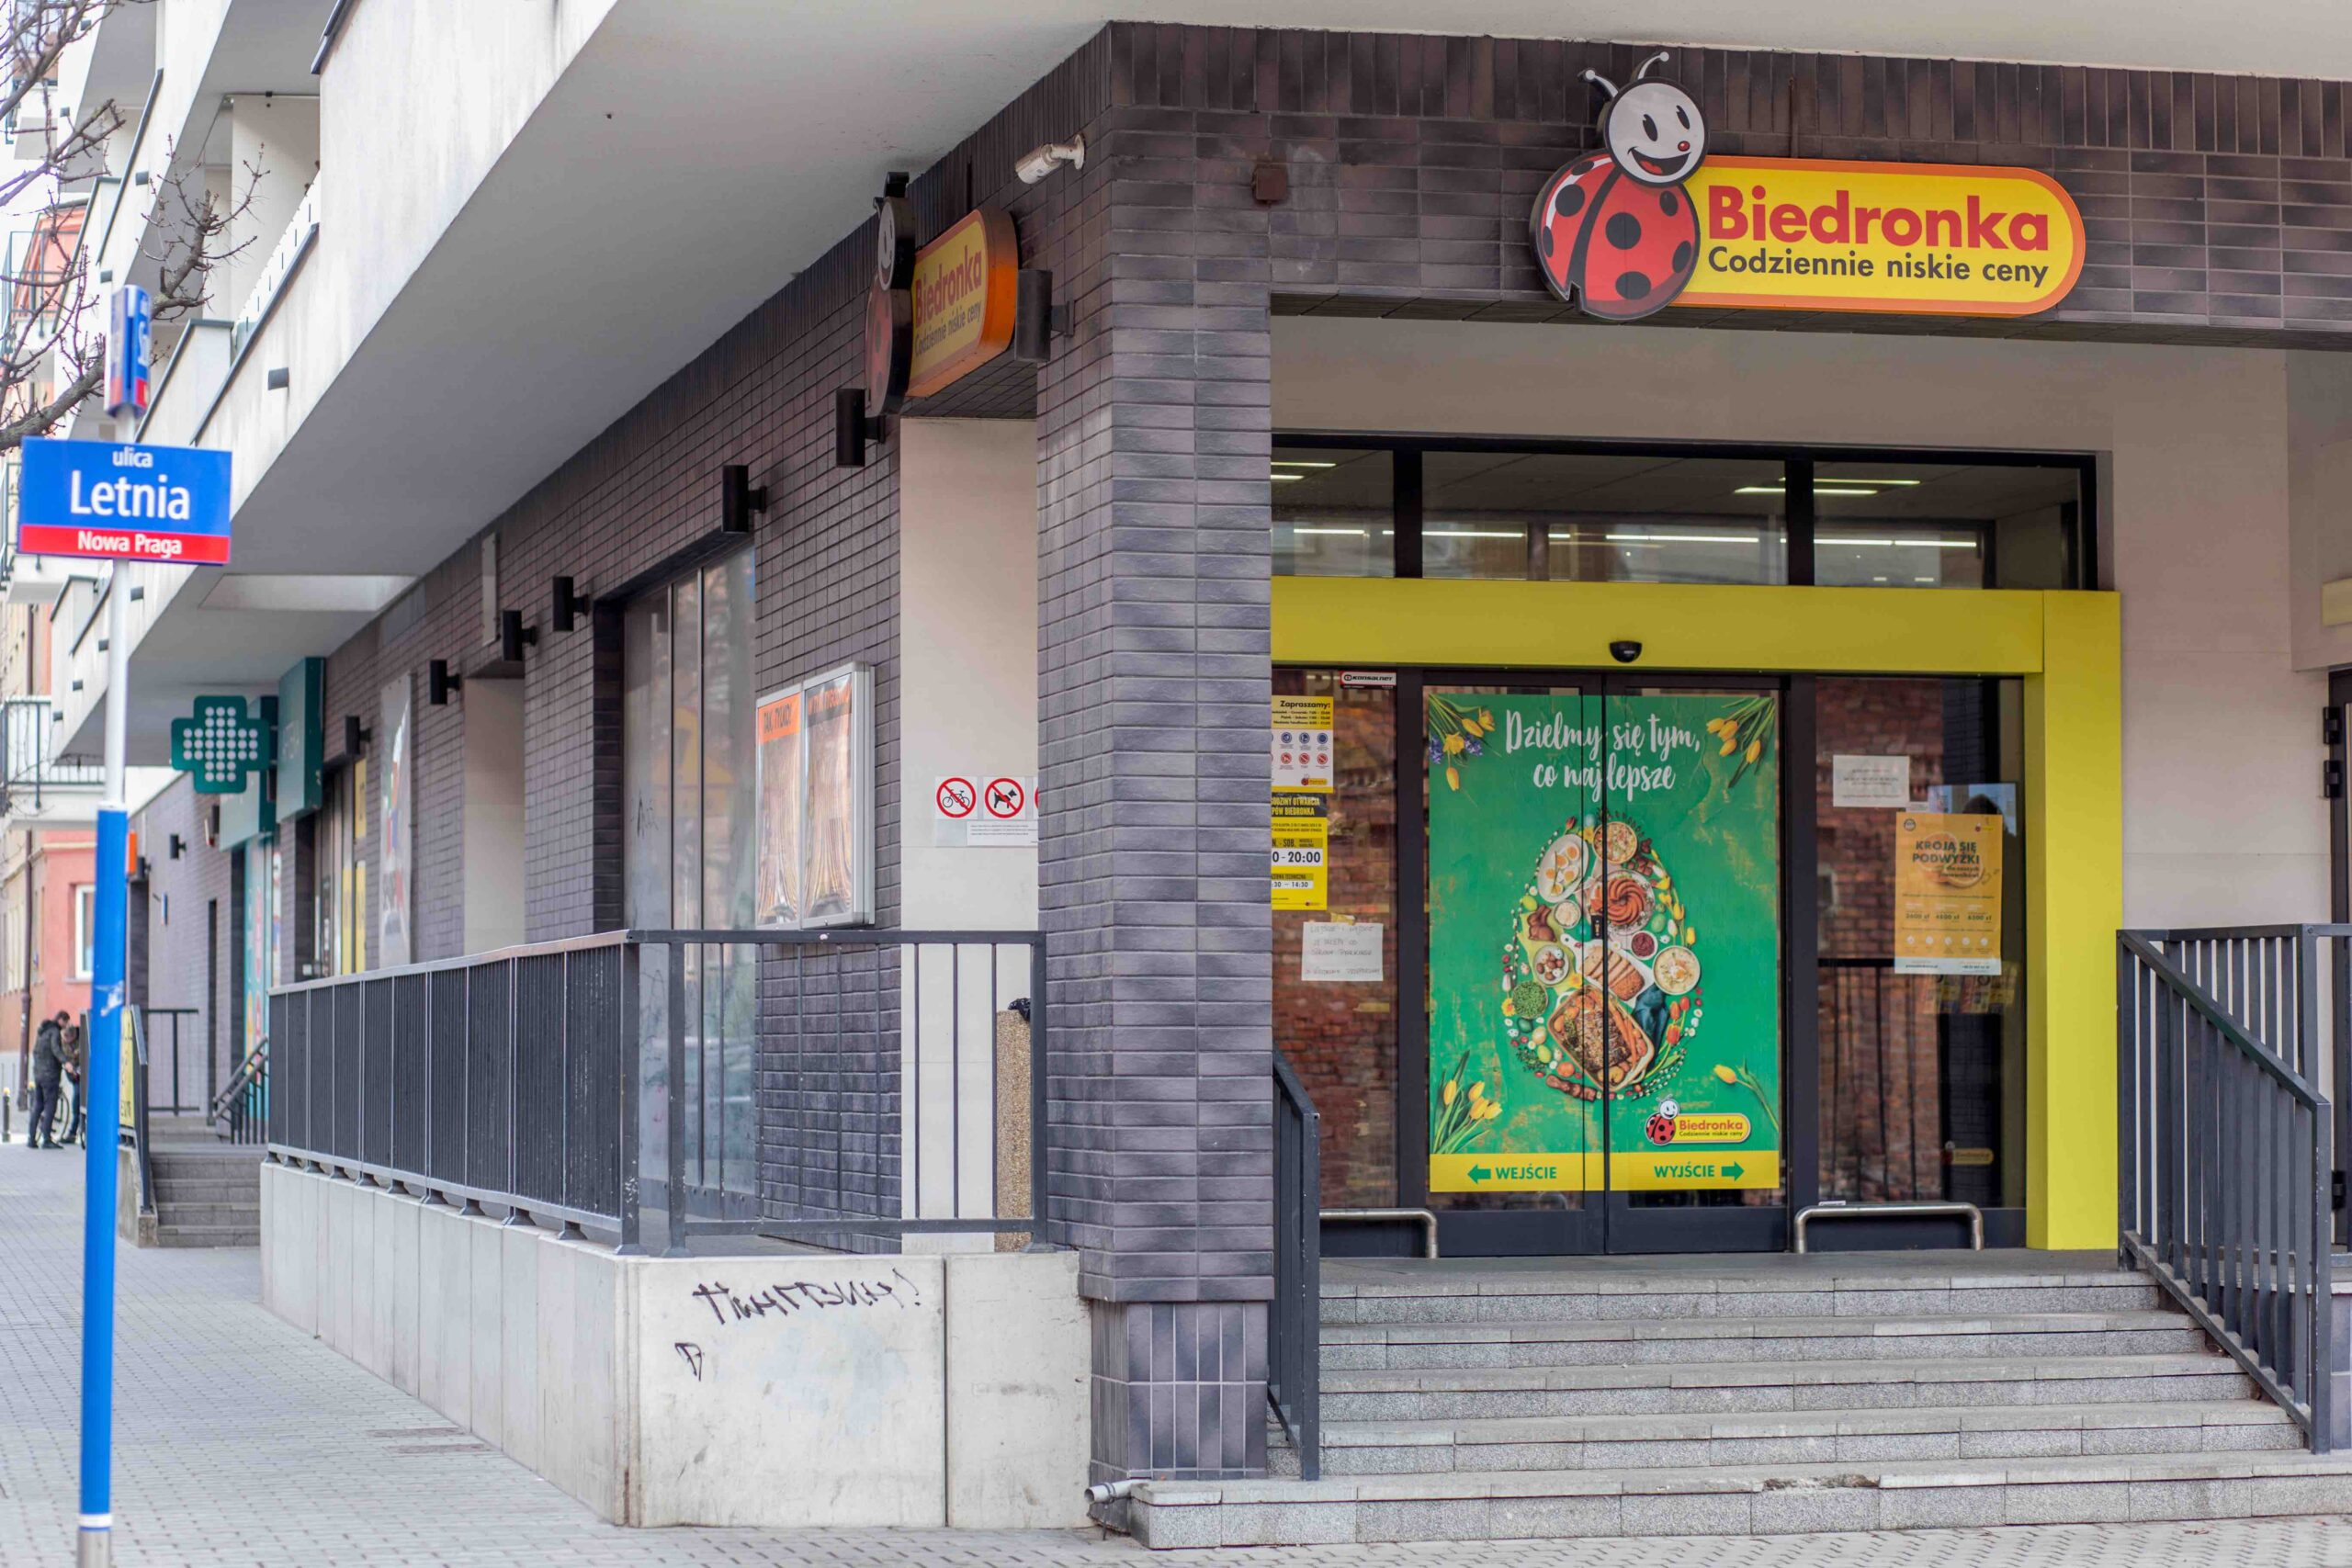 Lokal z najemcą Biedronka